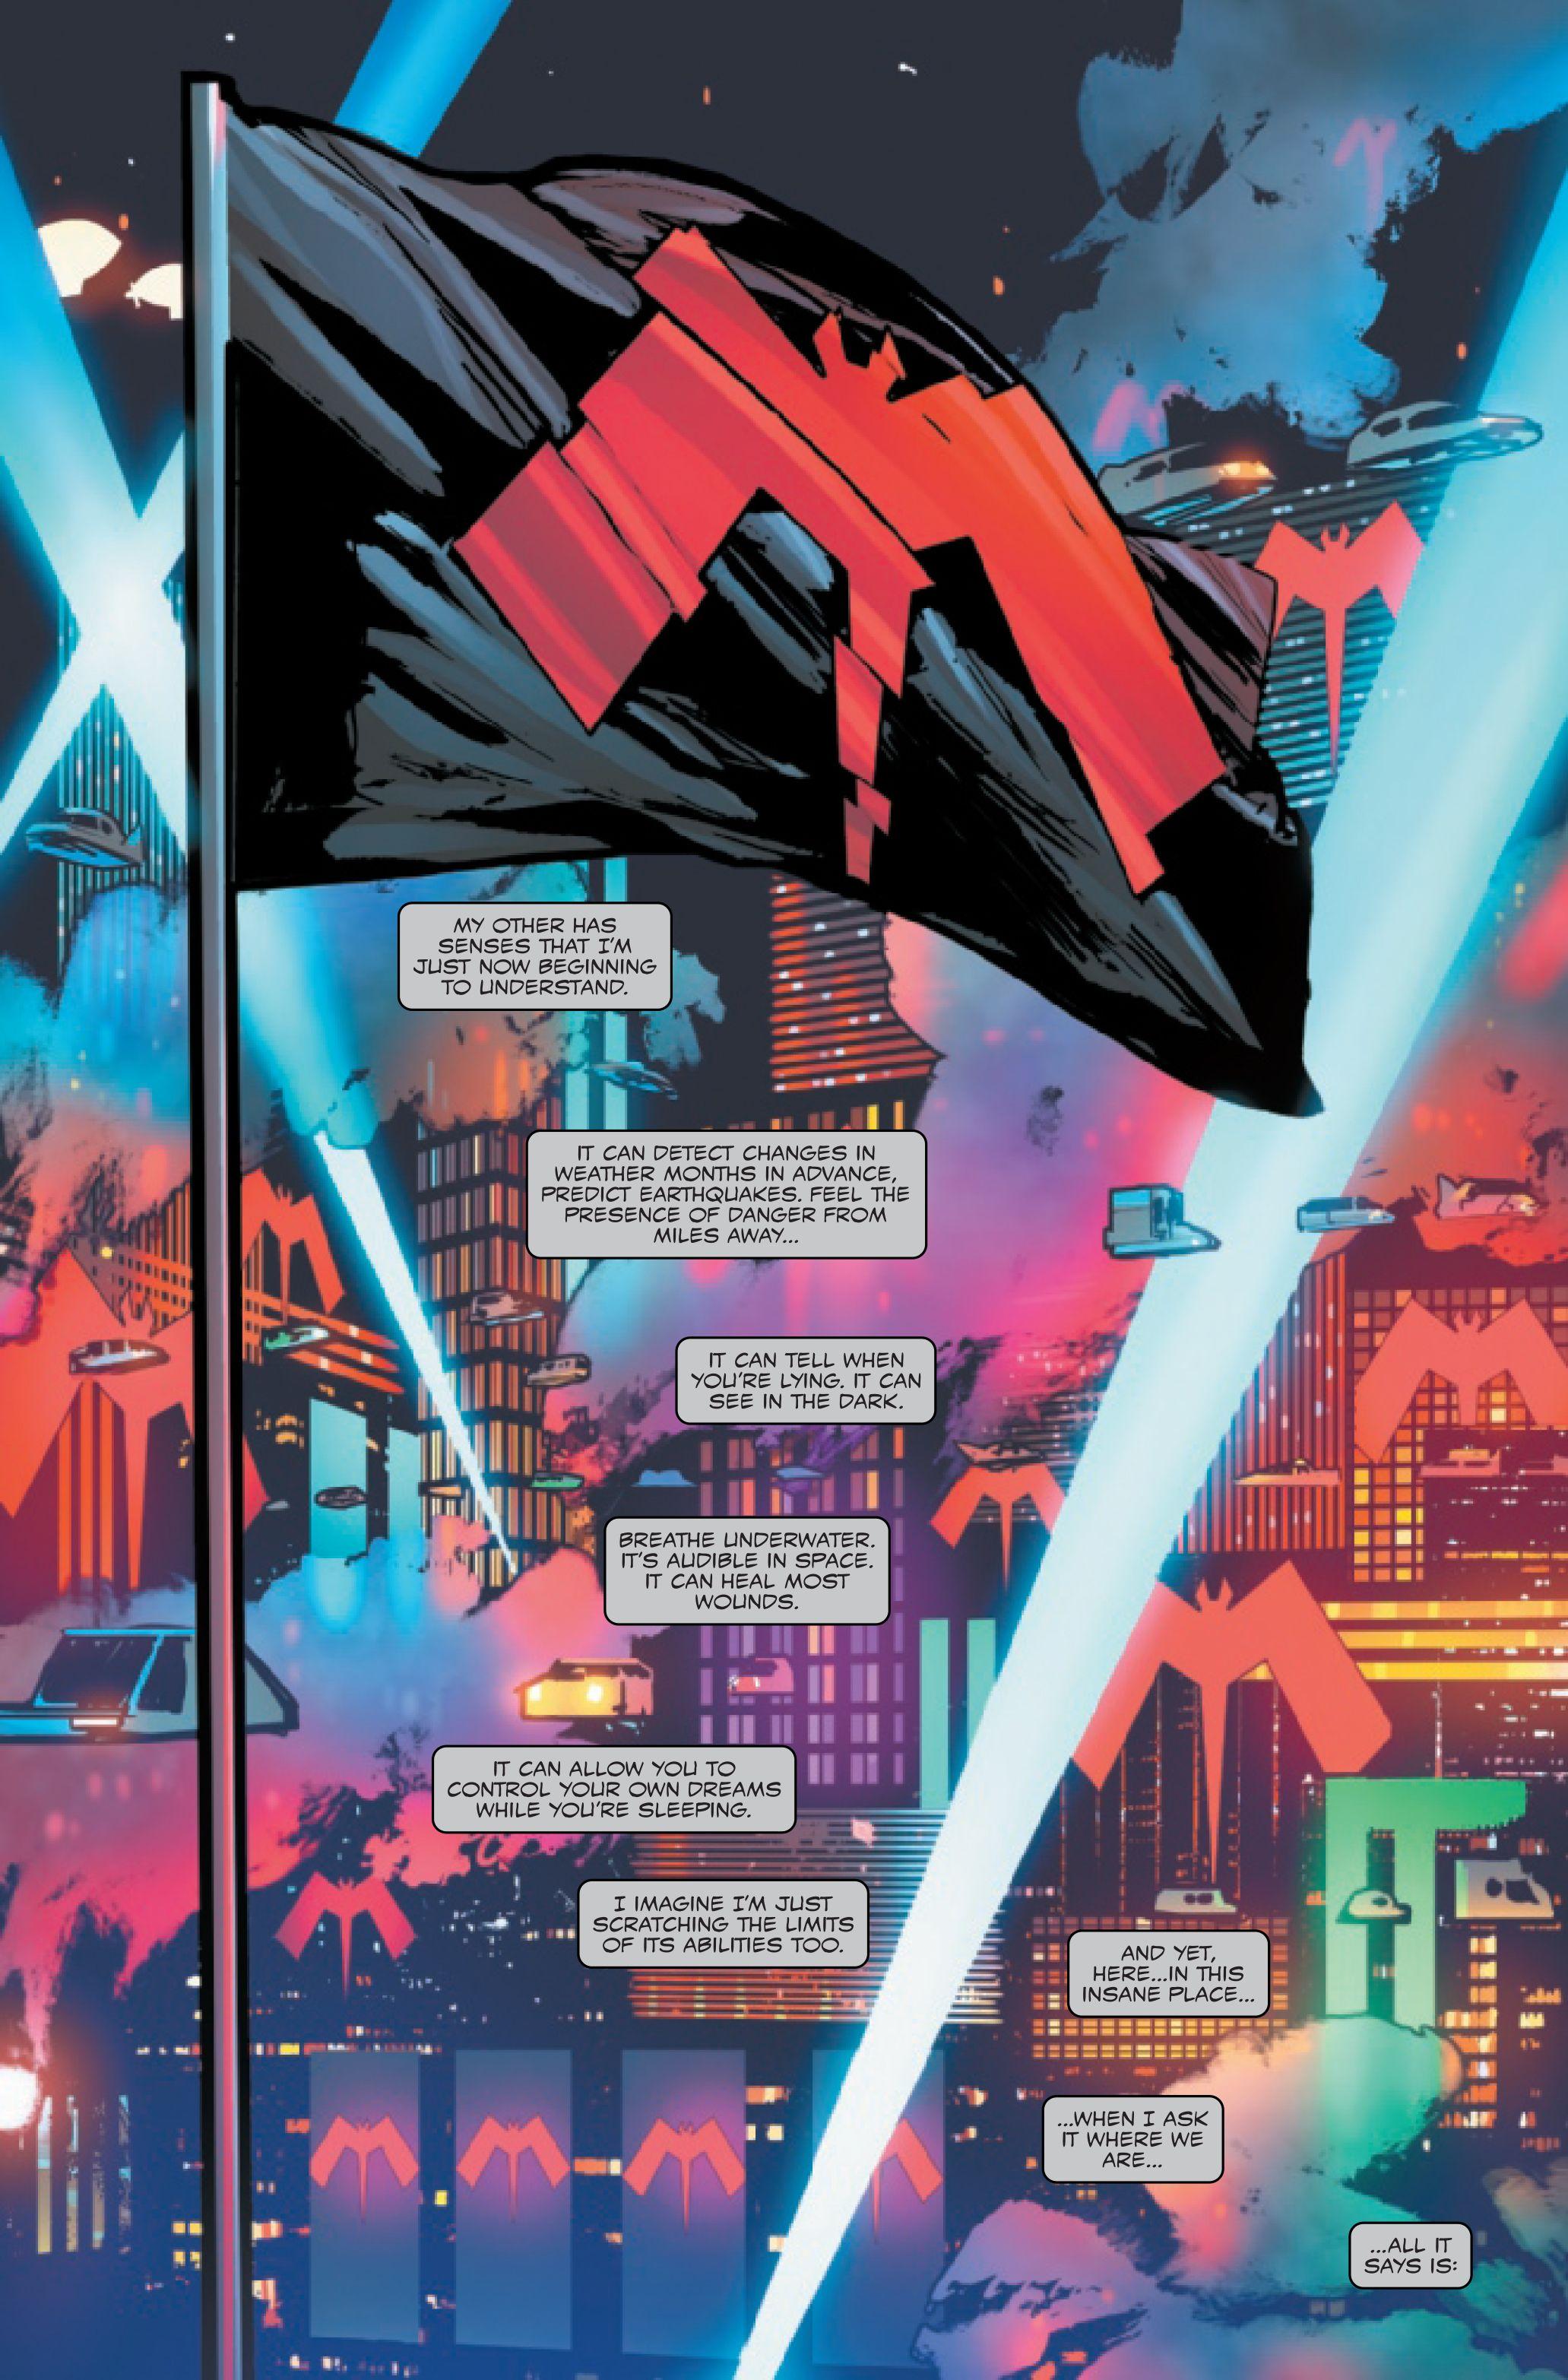 Venom: Simbiote alienígena de Eddie Brock [SPOILER] e Ed pela primeira vez 3